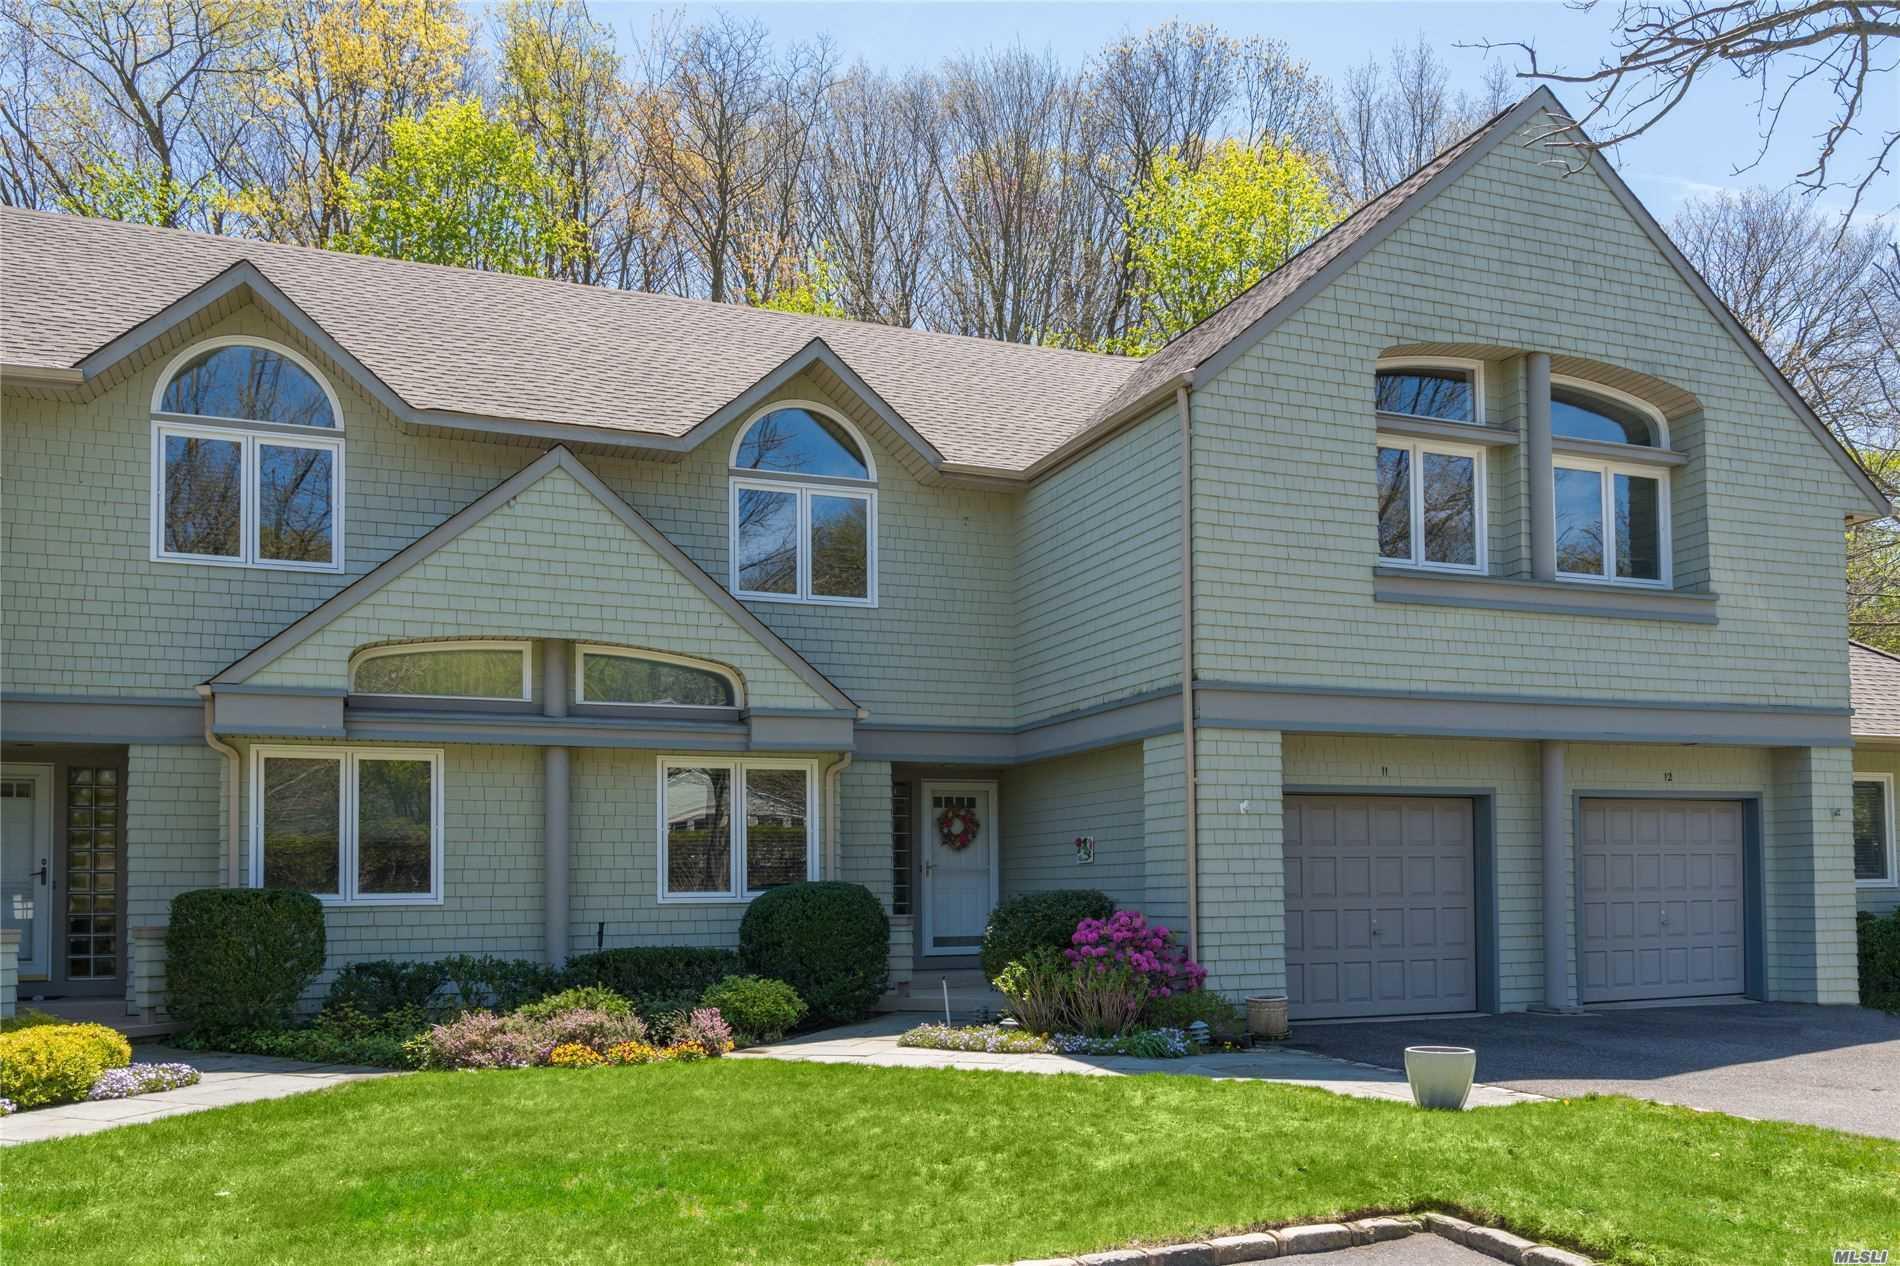 Property for sale at 11 Insbrook Court, Huntington NY 11743, Huntington,  New York 11743